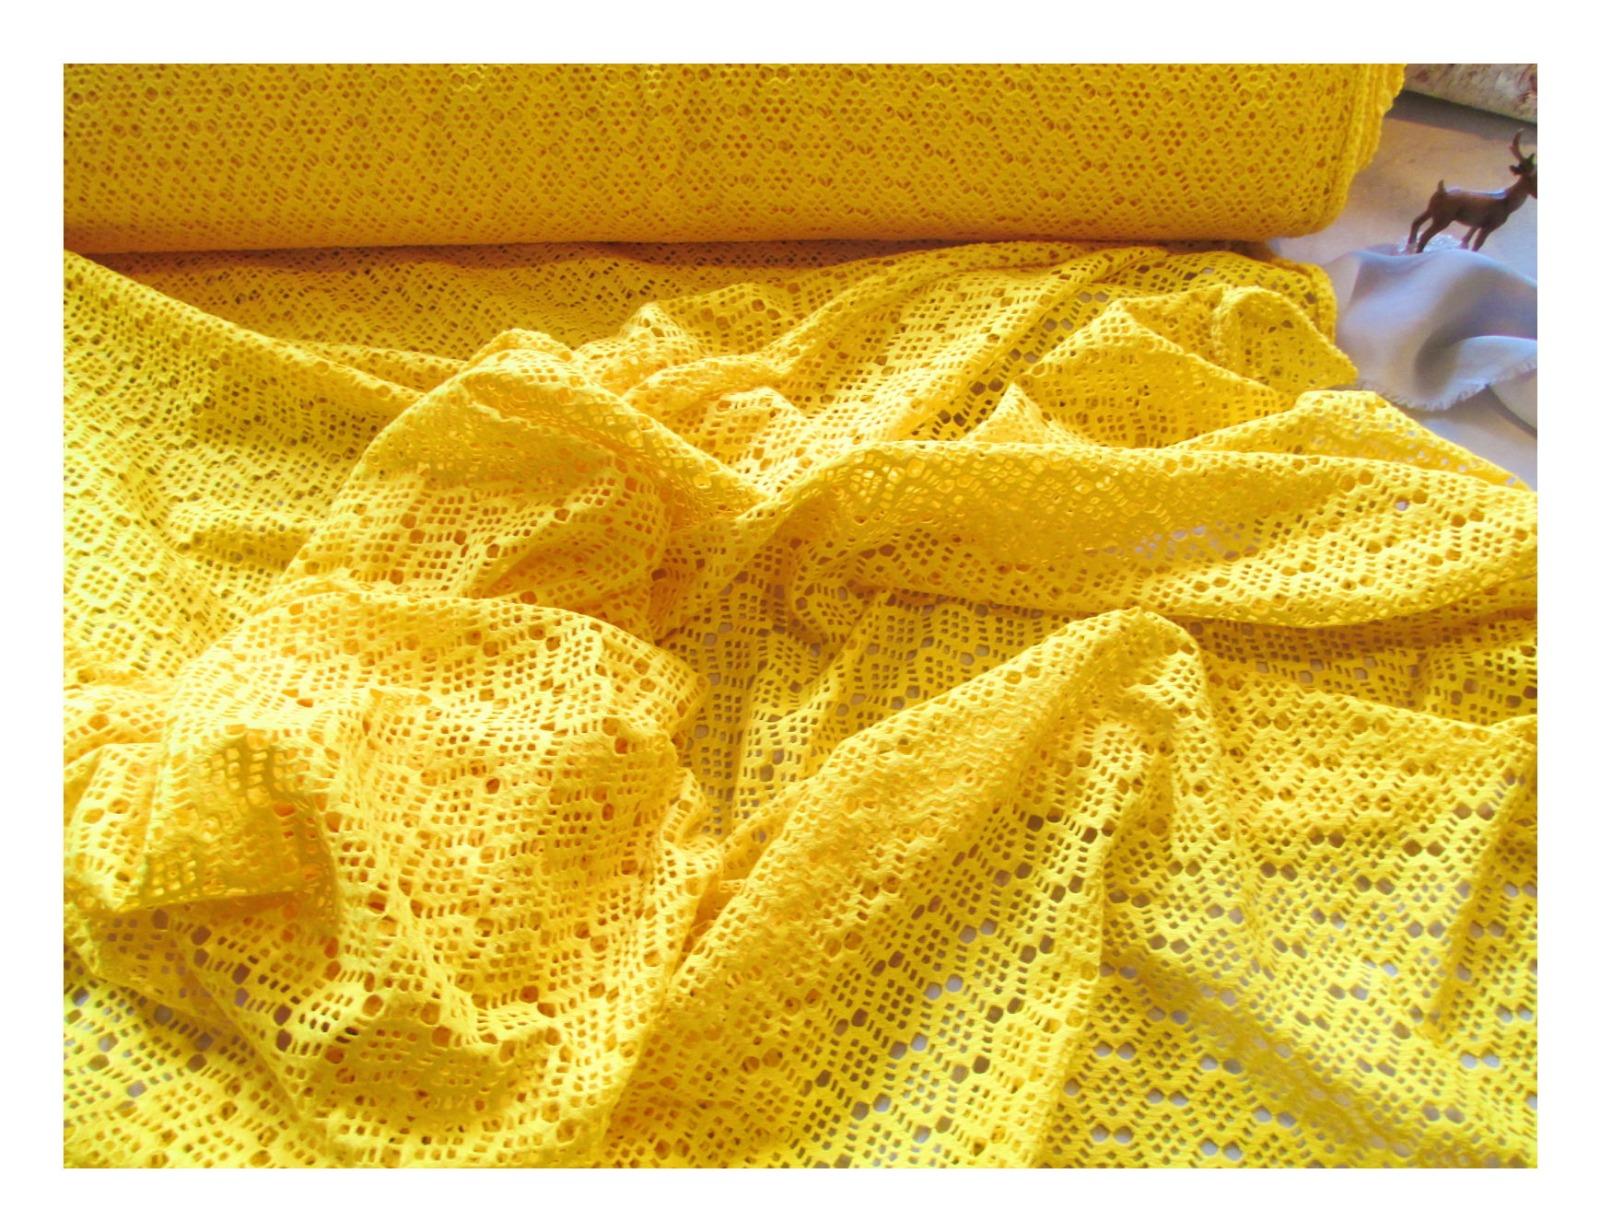 Sommerrock Sunny aus Spitze Gelb 7